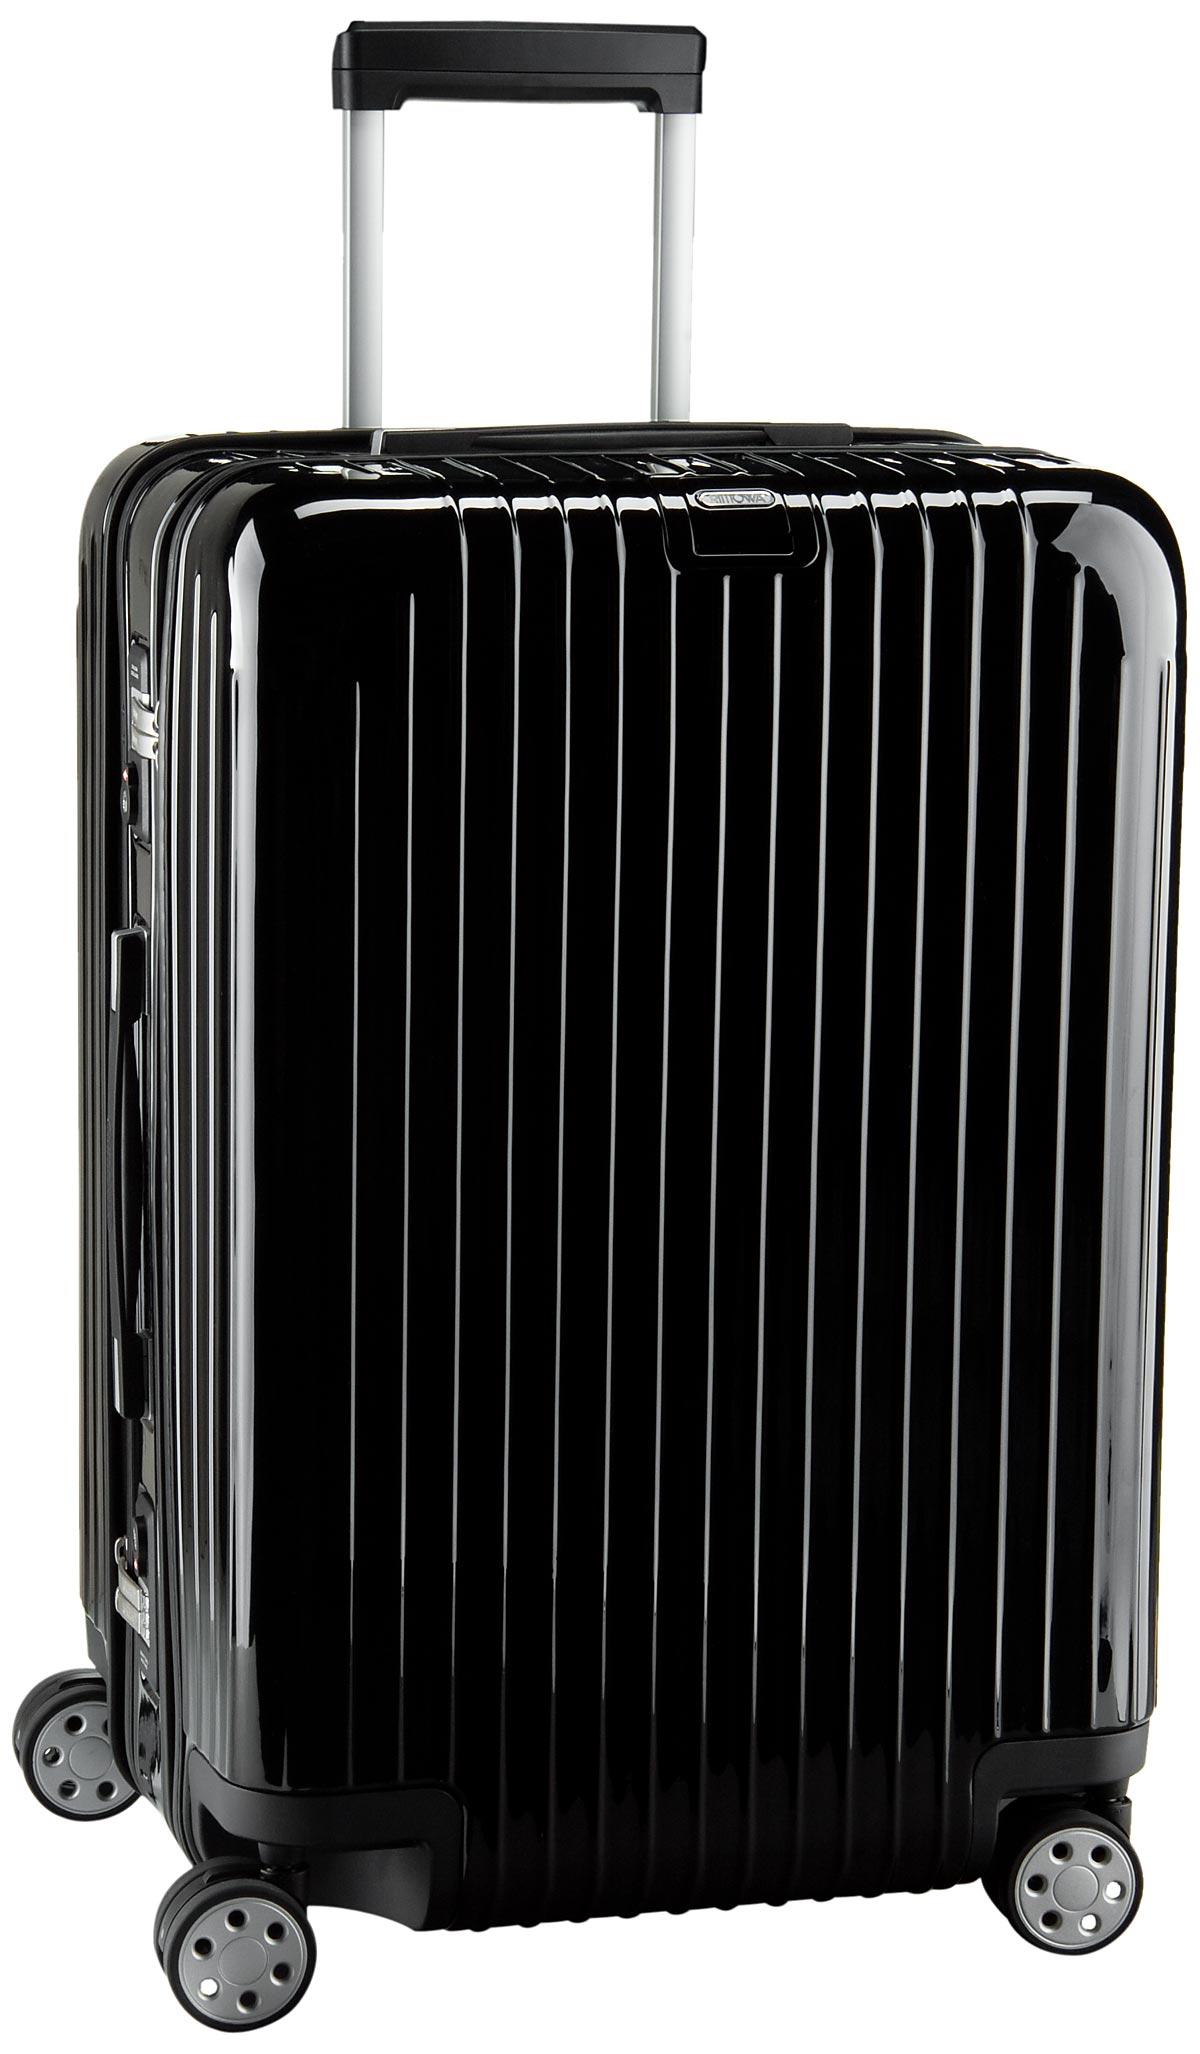 rimowa salsa deluxe 3 suiter 65 preisvergleich trolley. Black Bedroom Furniture Sets. Home Design Ideas